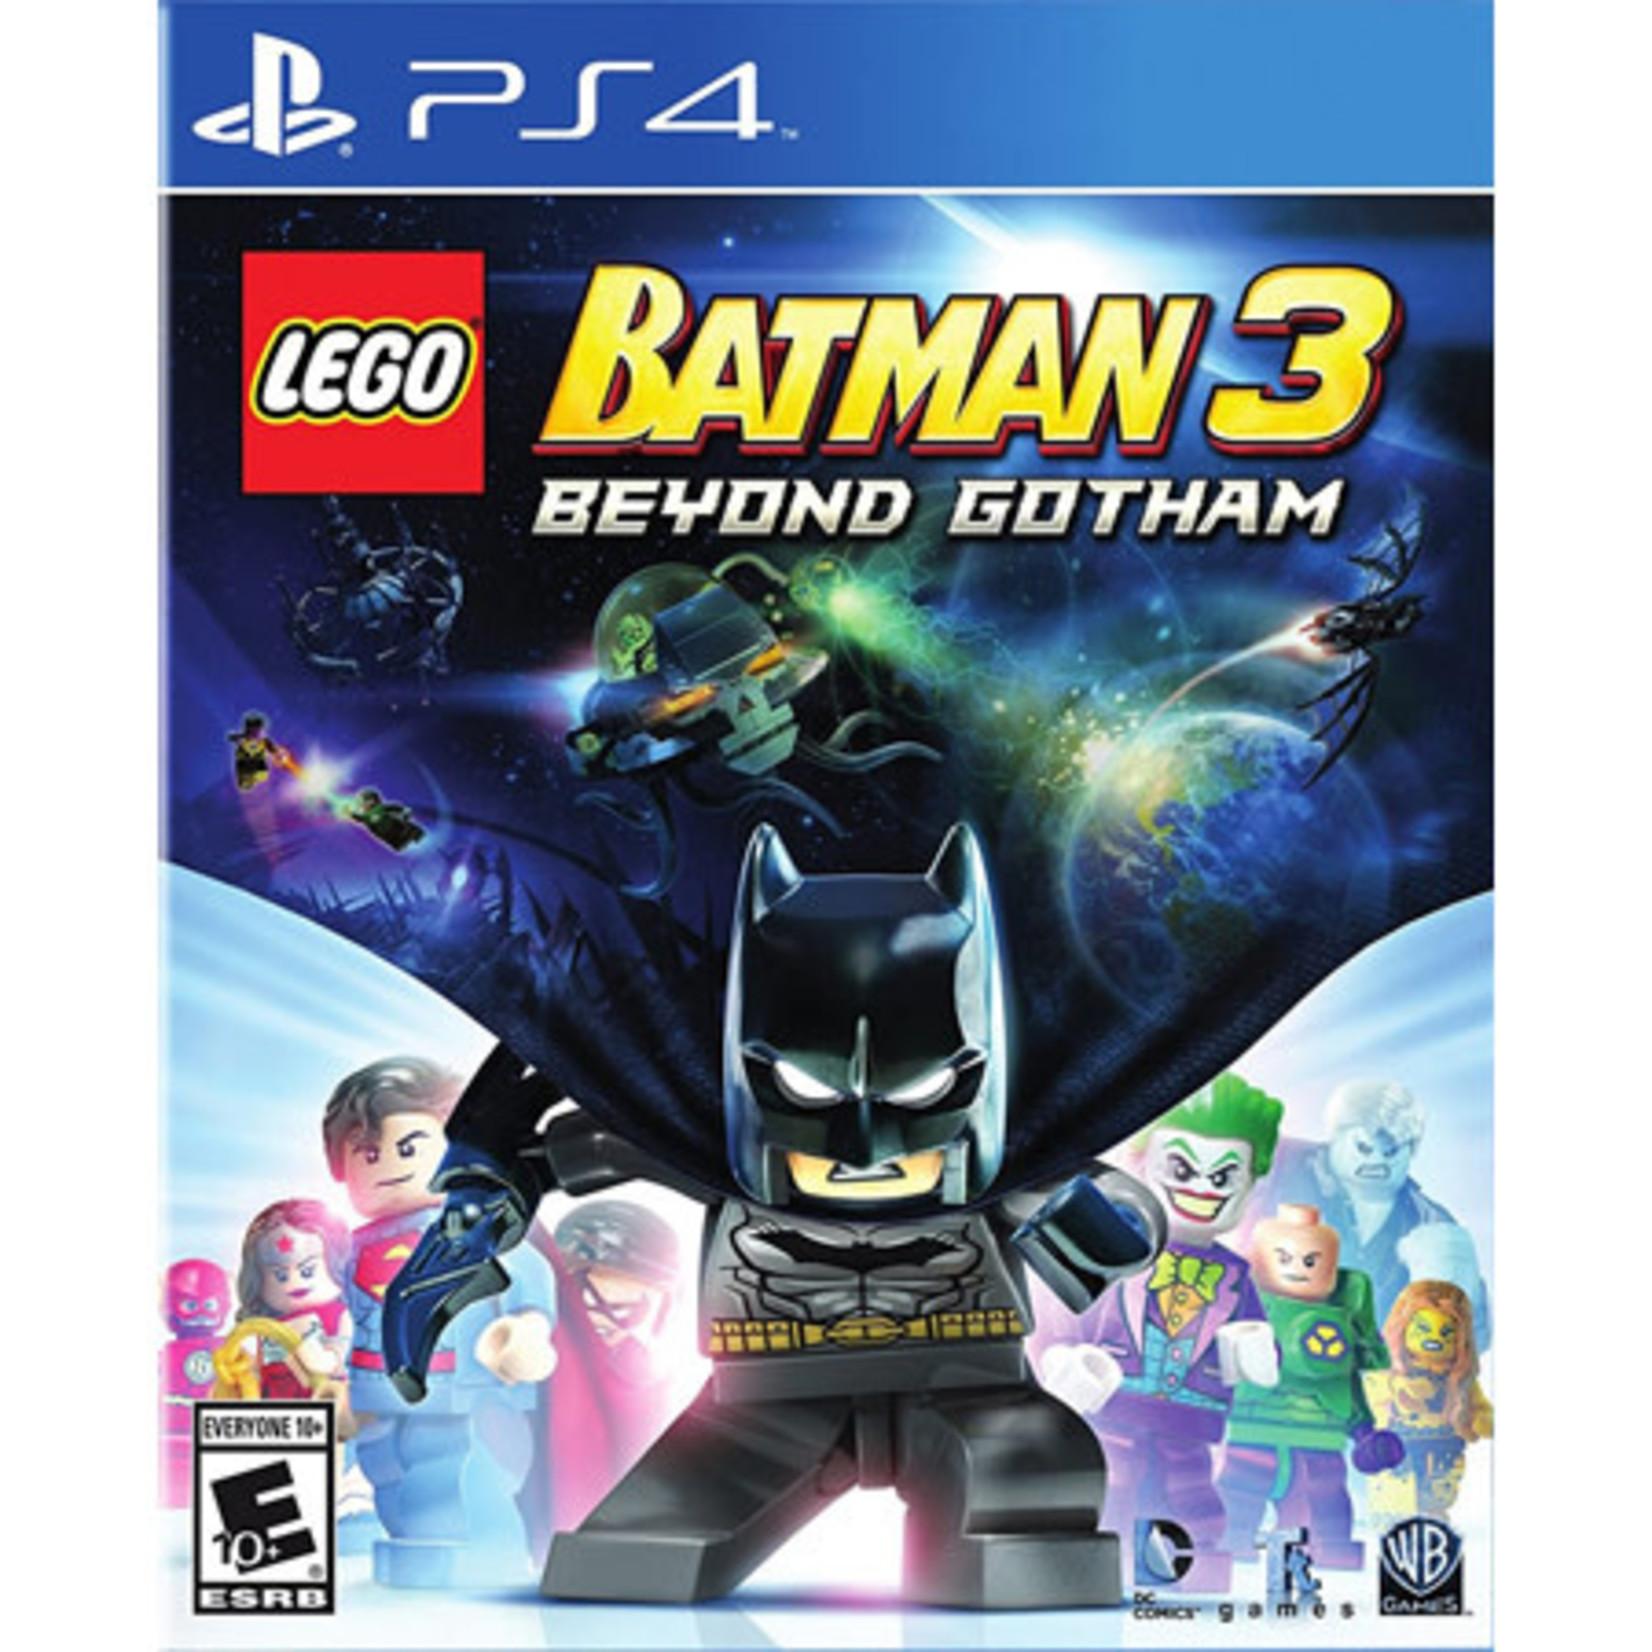 PS4-LEGO BATMAN 3: BEYOND GOTHAM